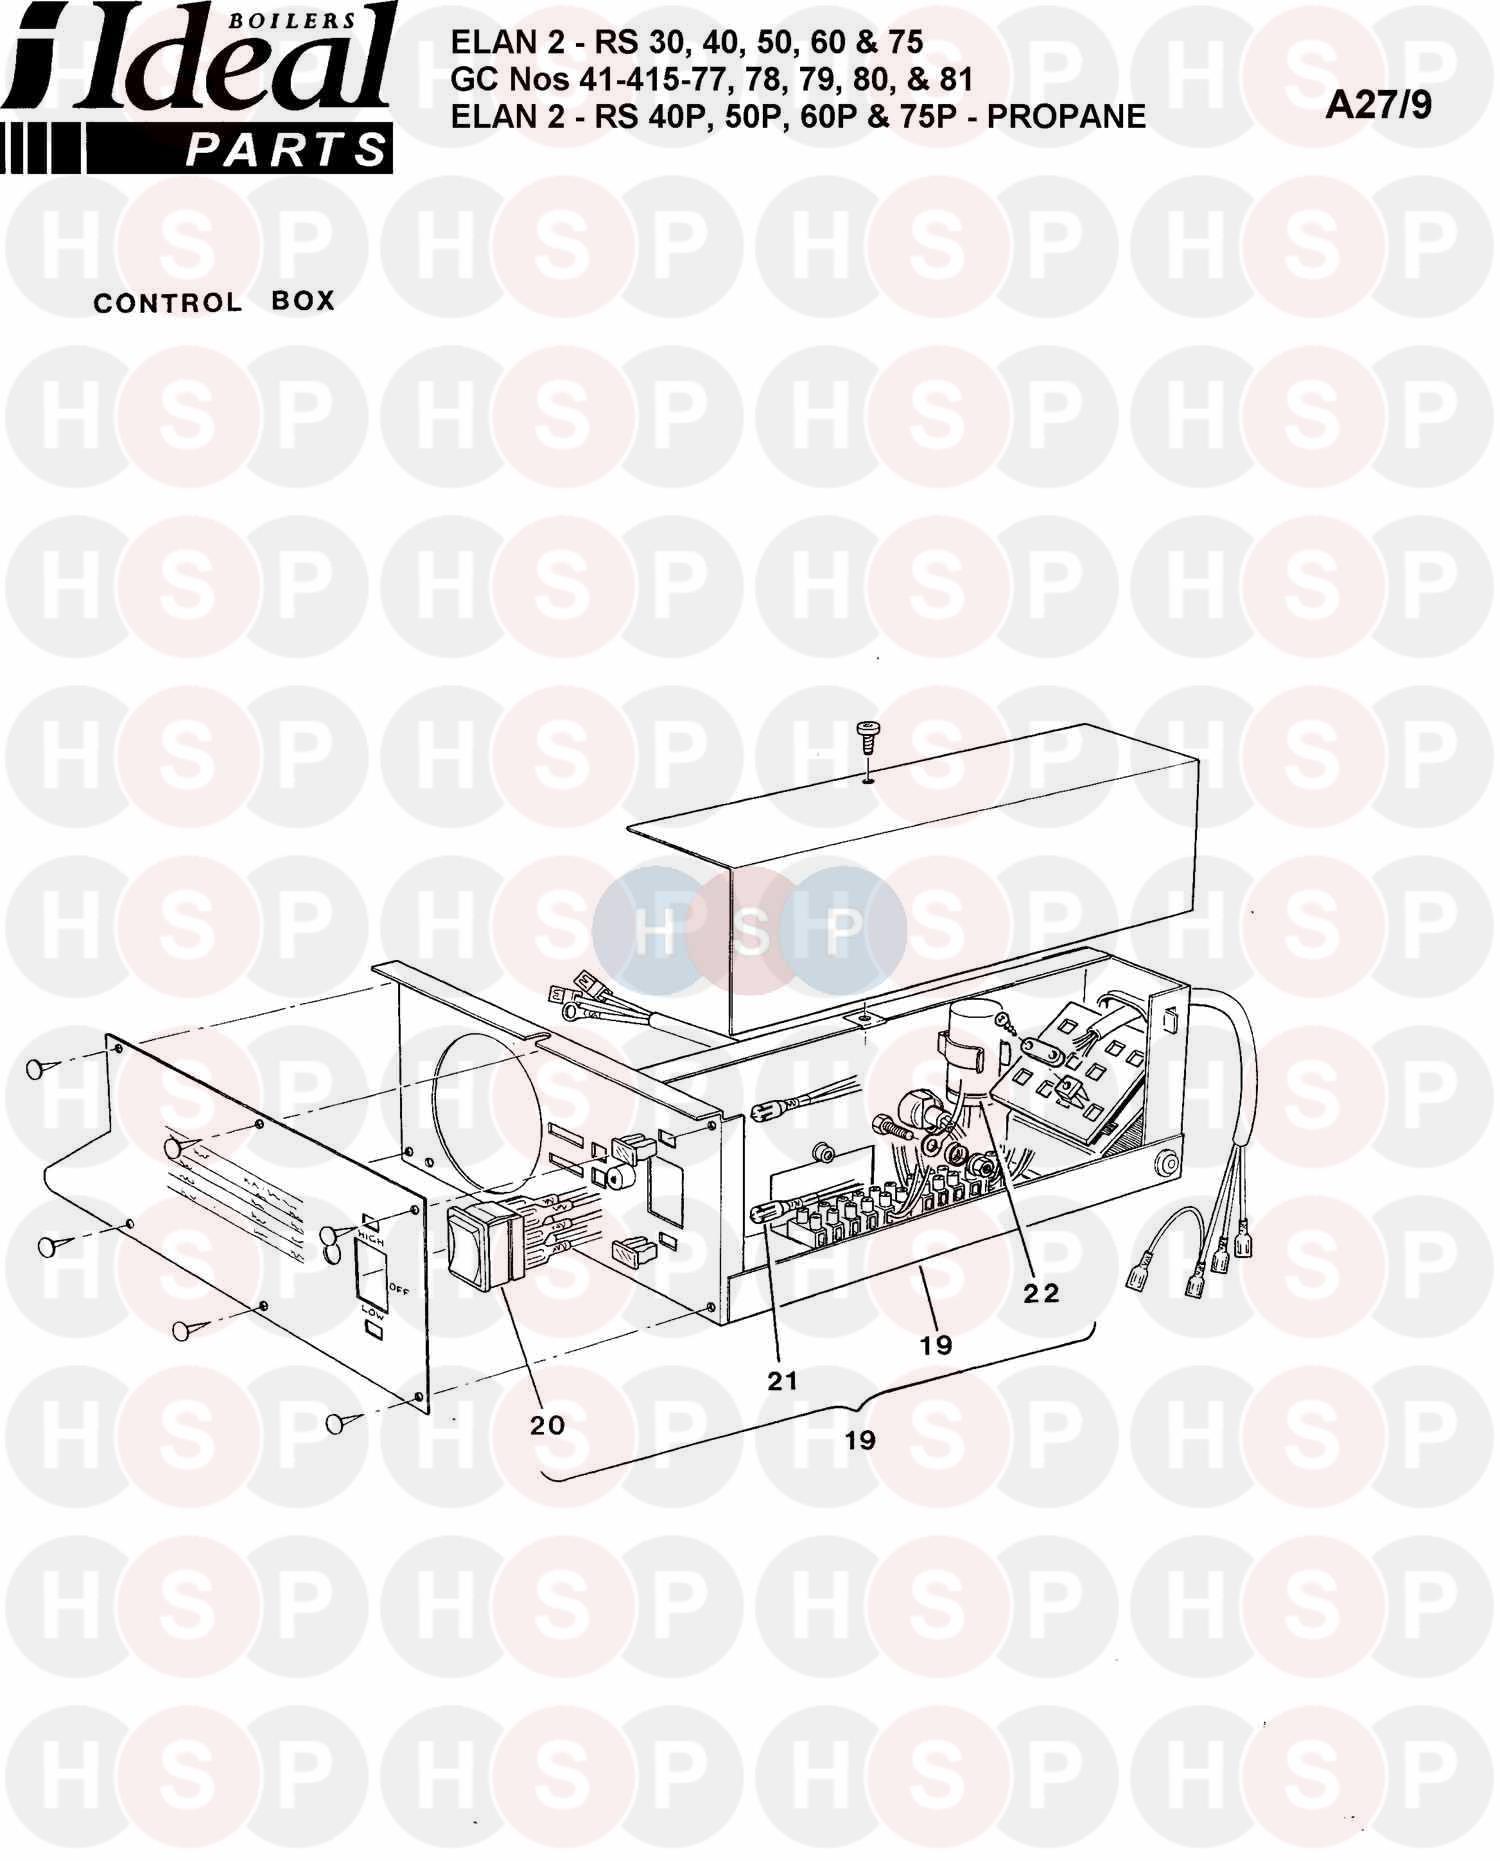 Ideal ELAN 2 RS 50 Appliance Diagram (Control Box Ass